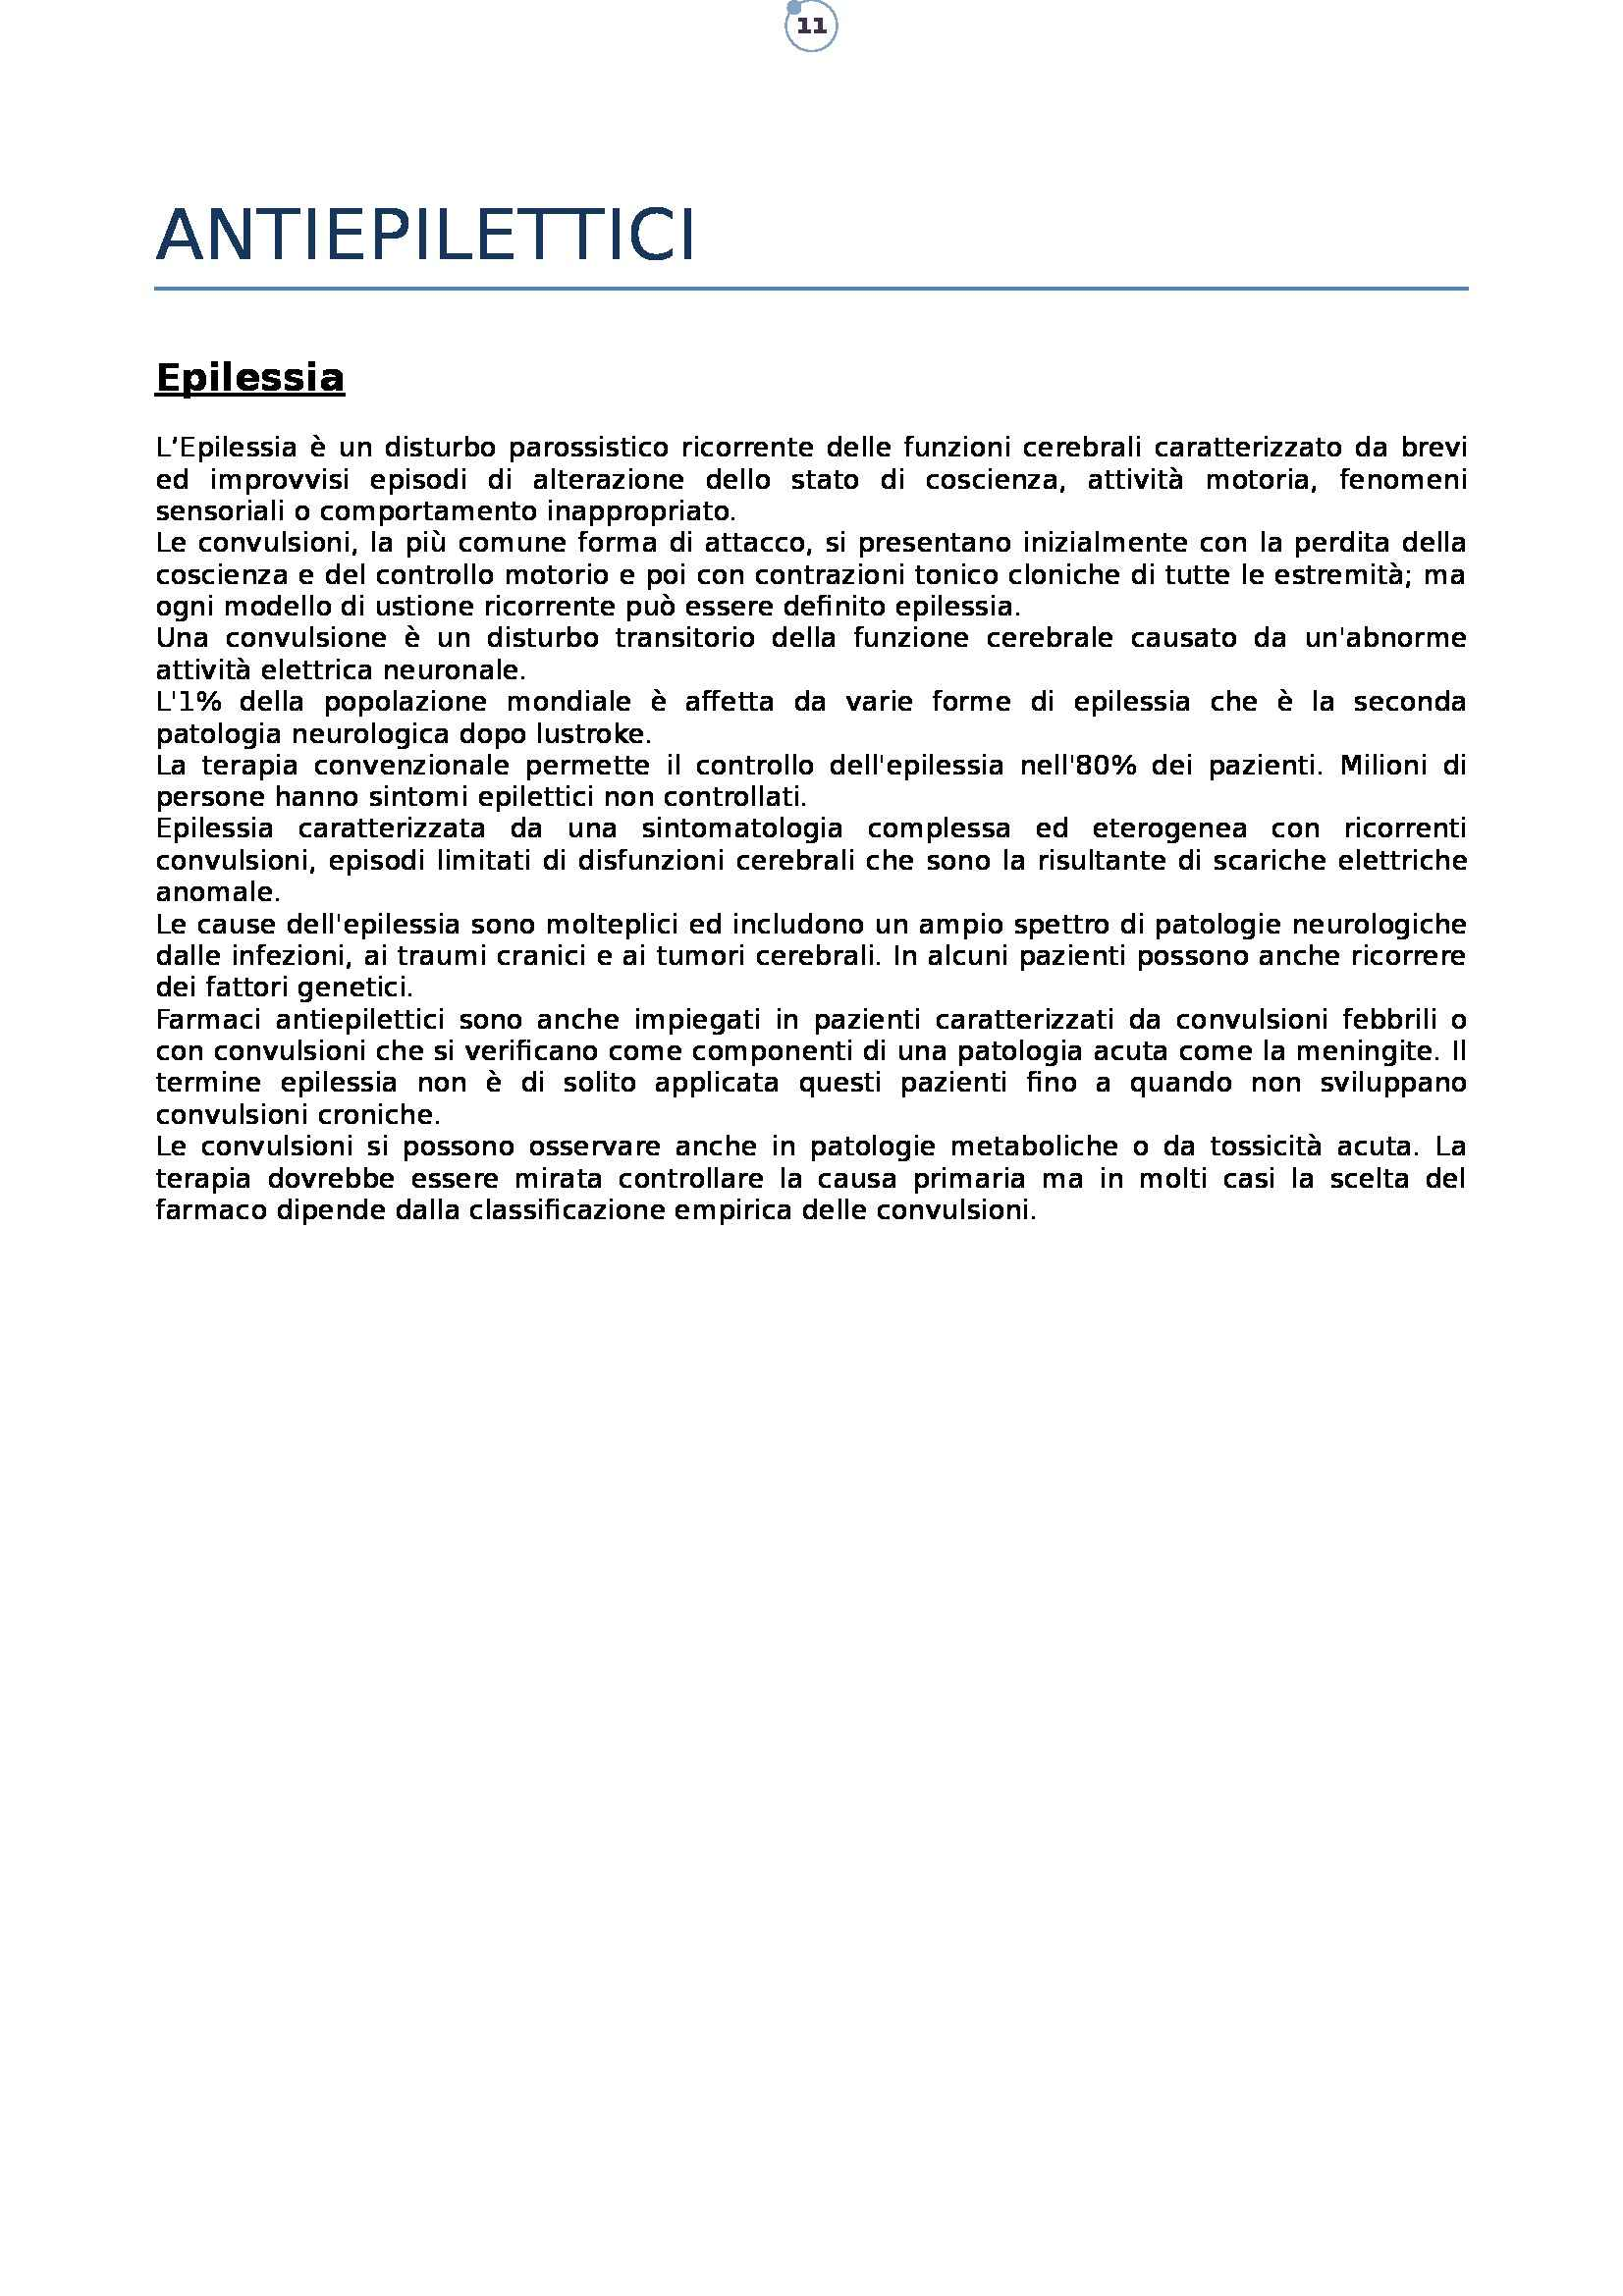 Farmacologia - antiepilettici